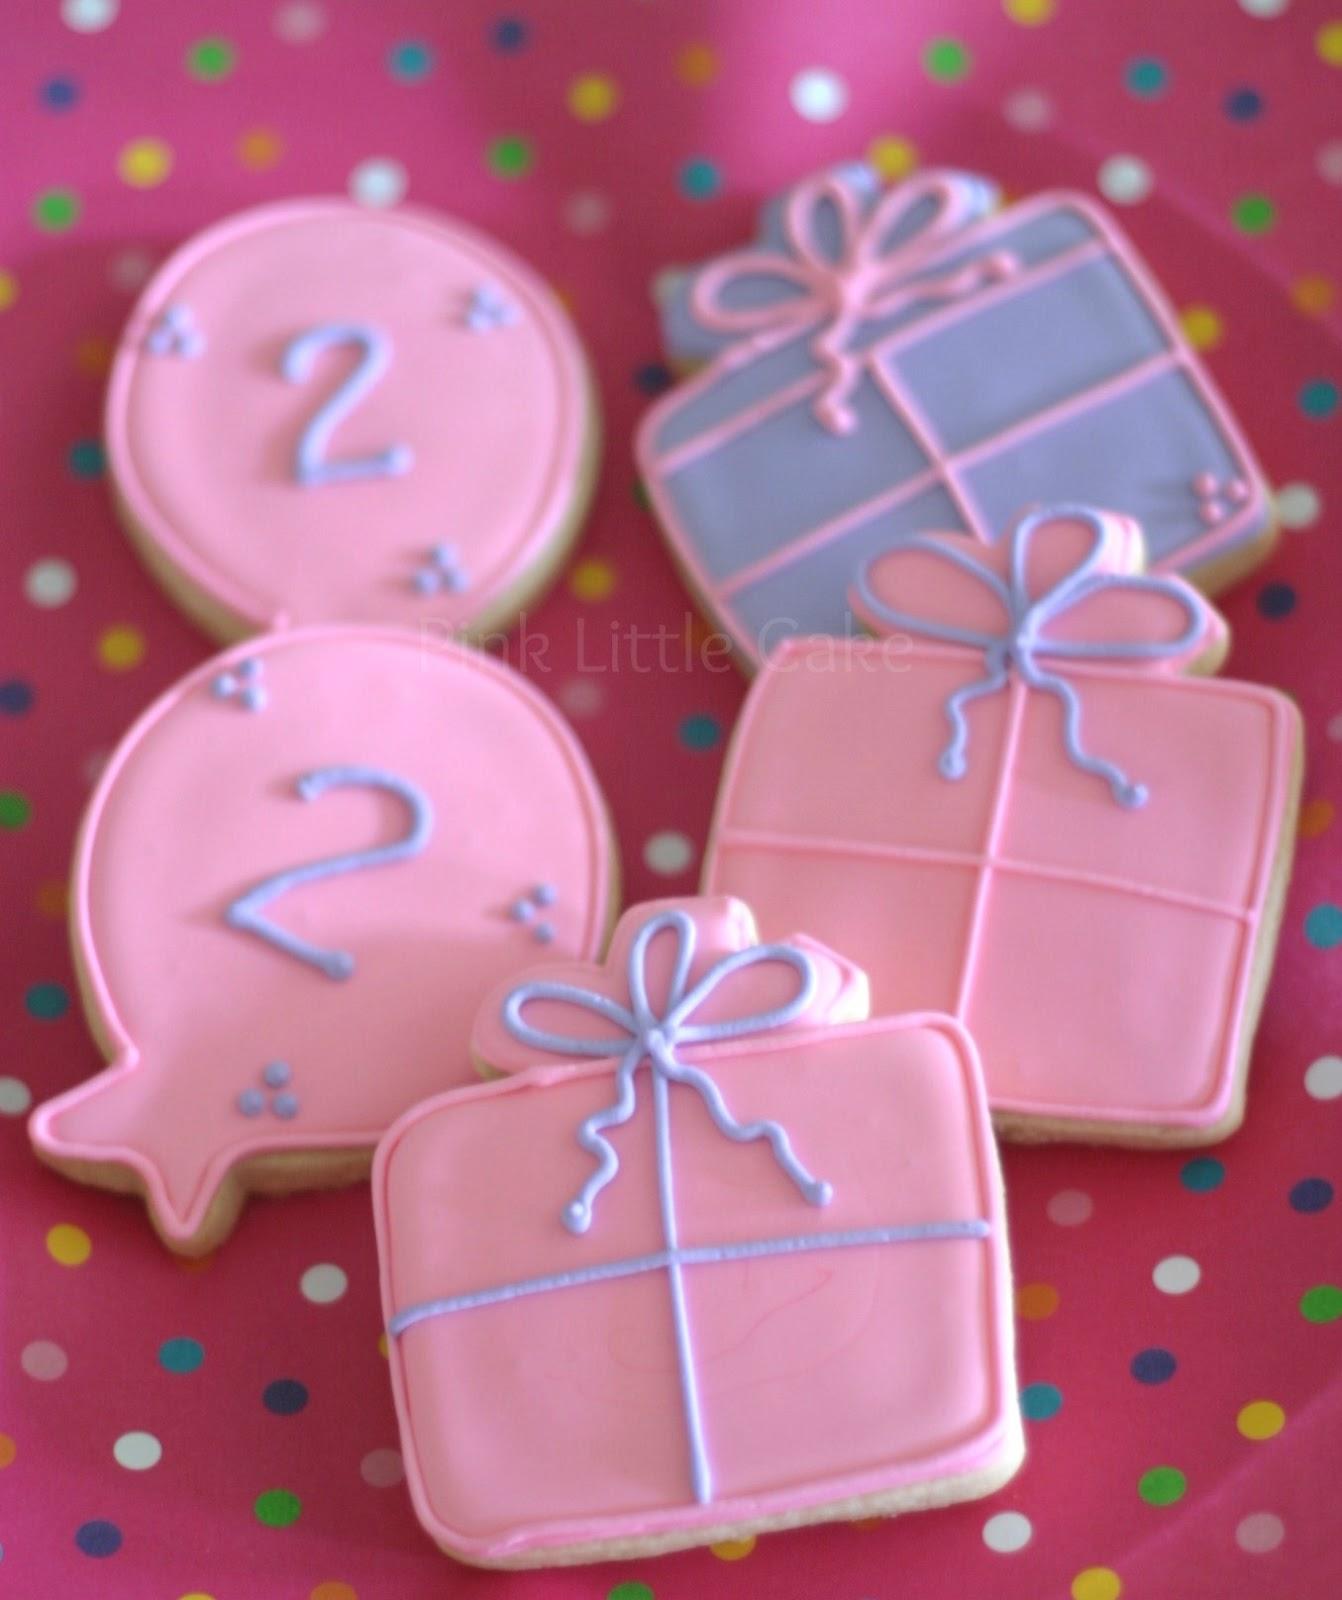 My Pink Little Cake: Pink and lavander Birthday Cookies